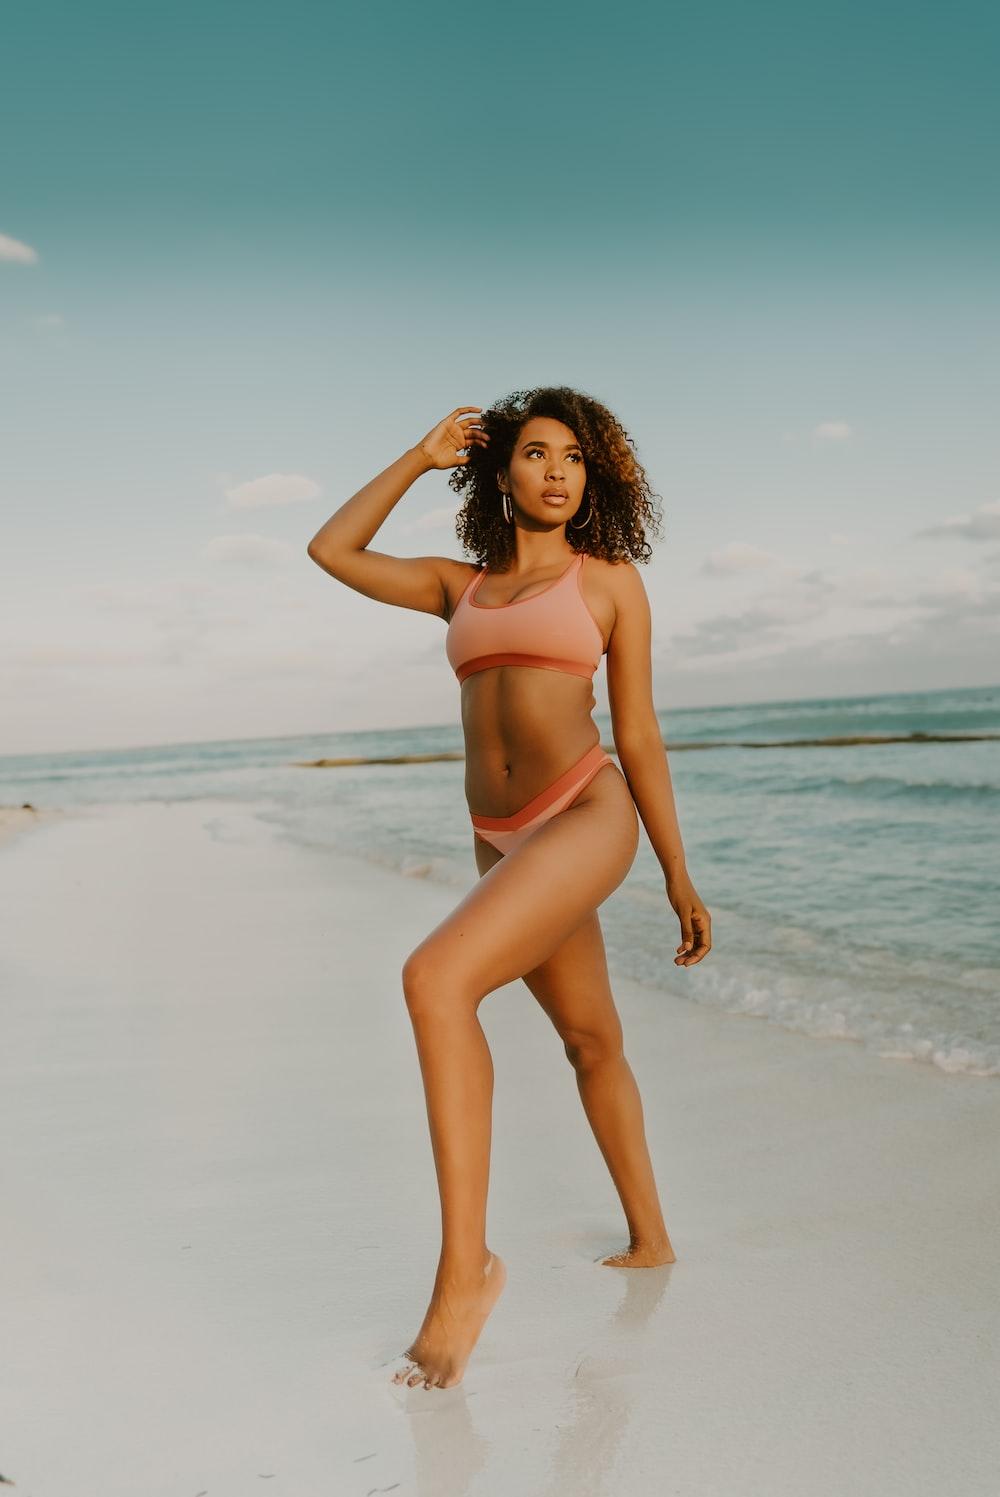 woman in red bikini standing on beach during daytime